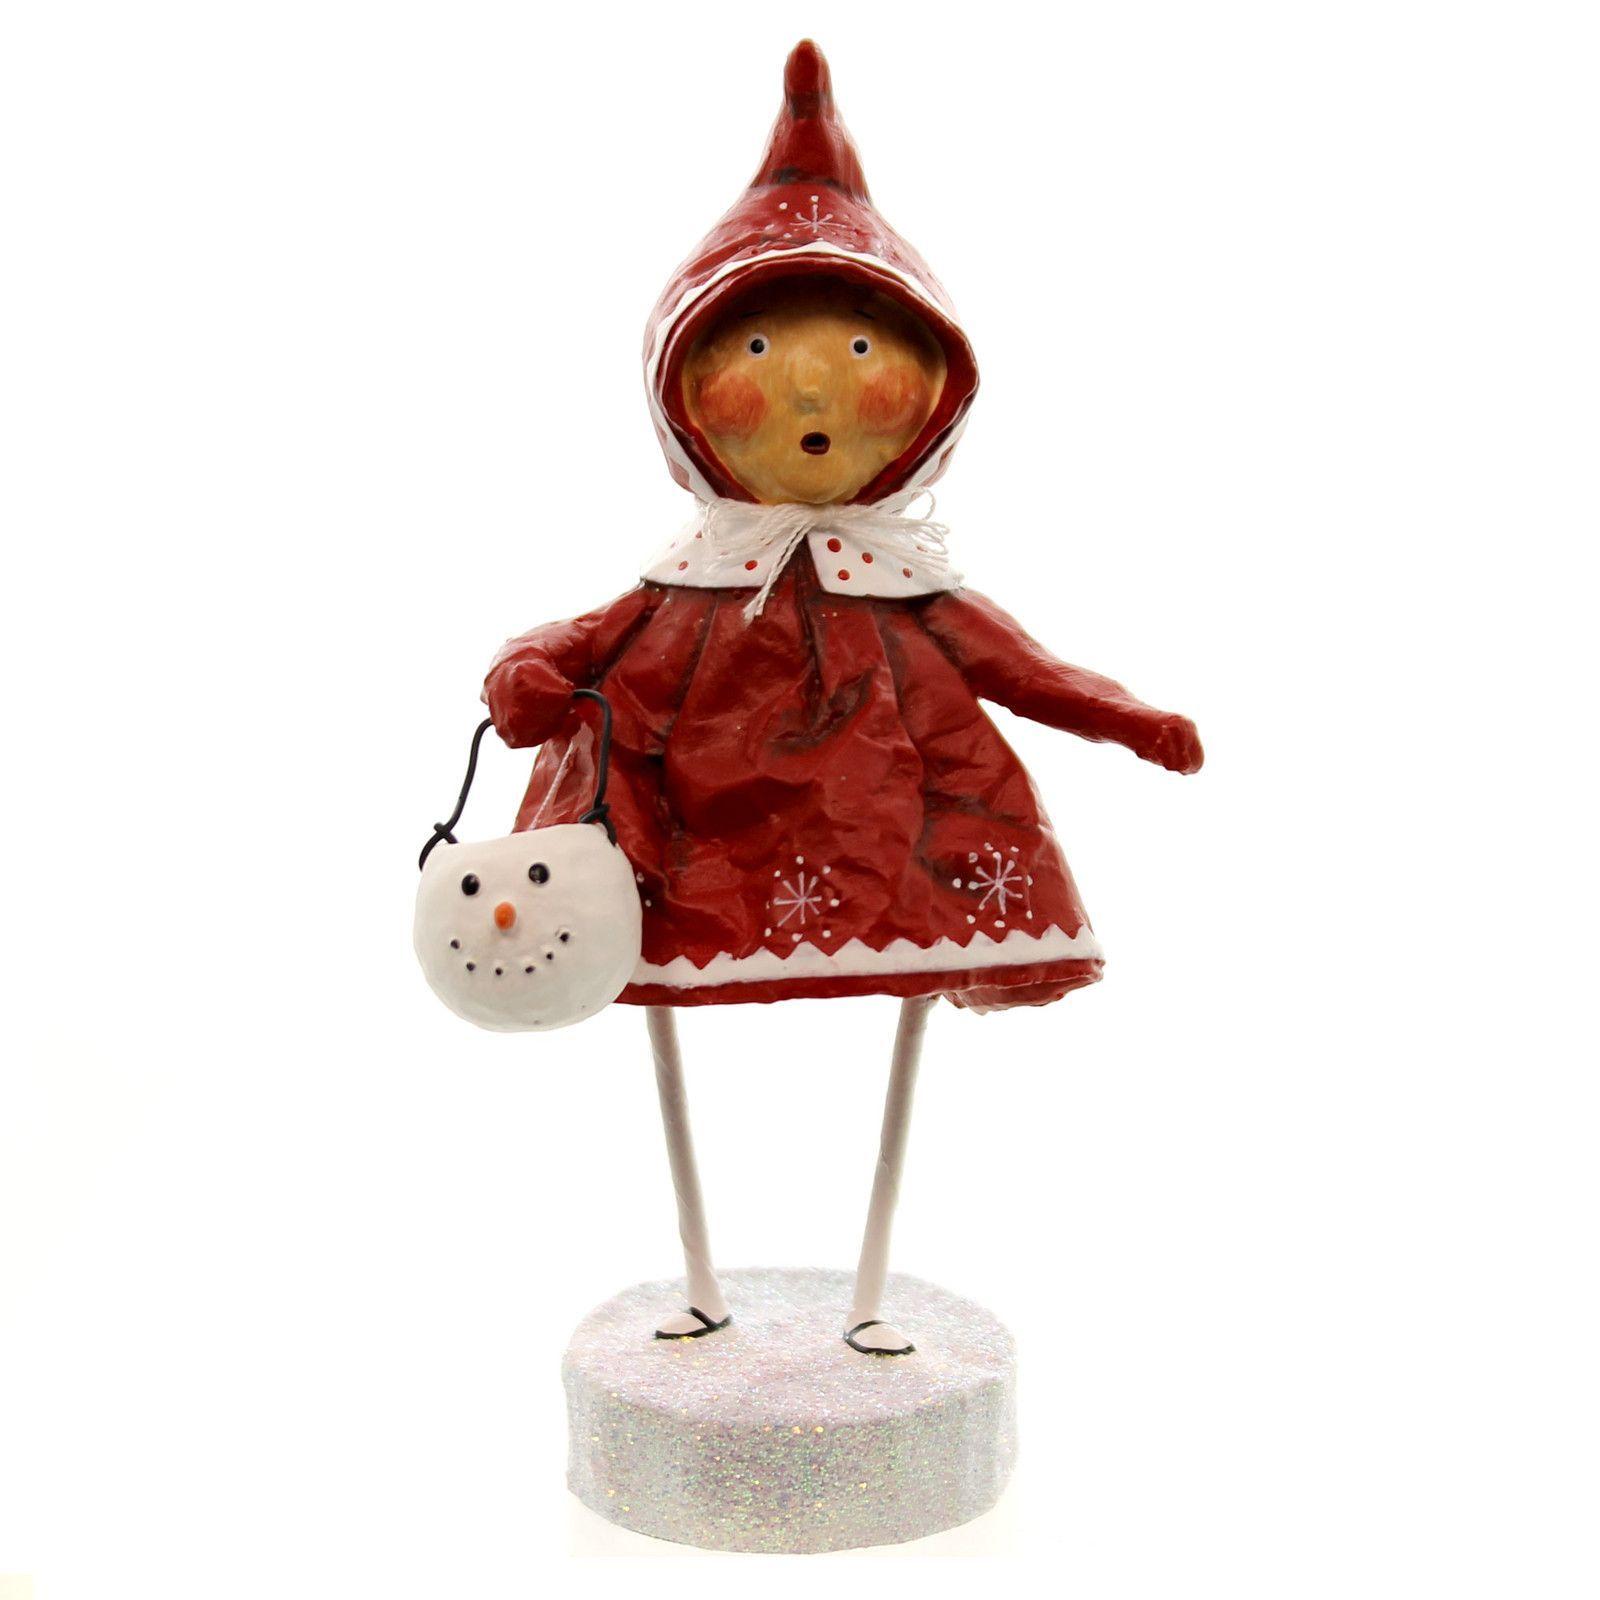 Bundled Up Brenna Christmas Figurine